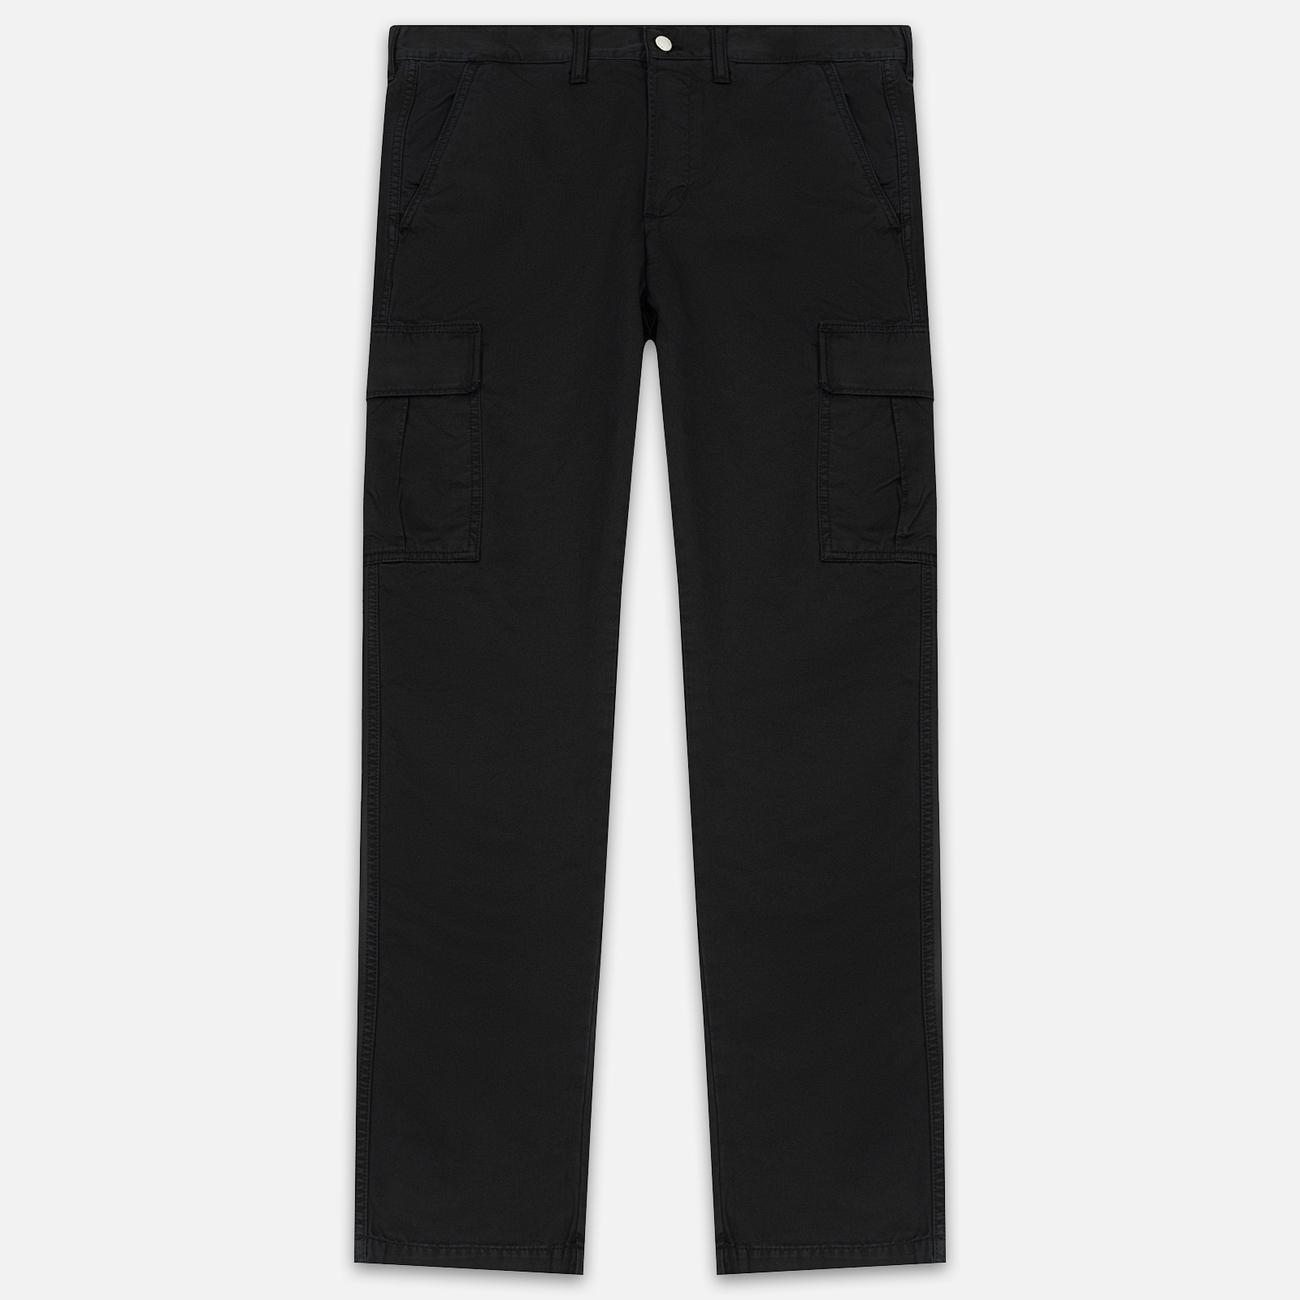 Мужские брюки Edwin 45 Combat 9 Oz Garment Dyed Enzyme Wash Black